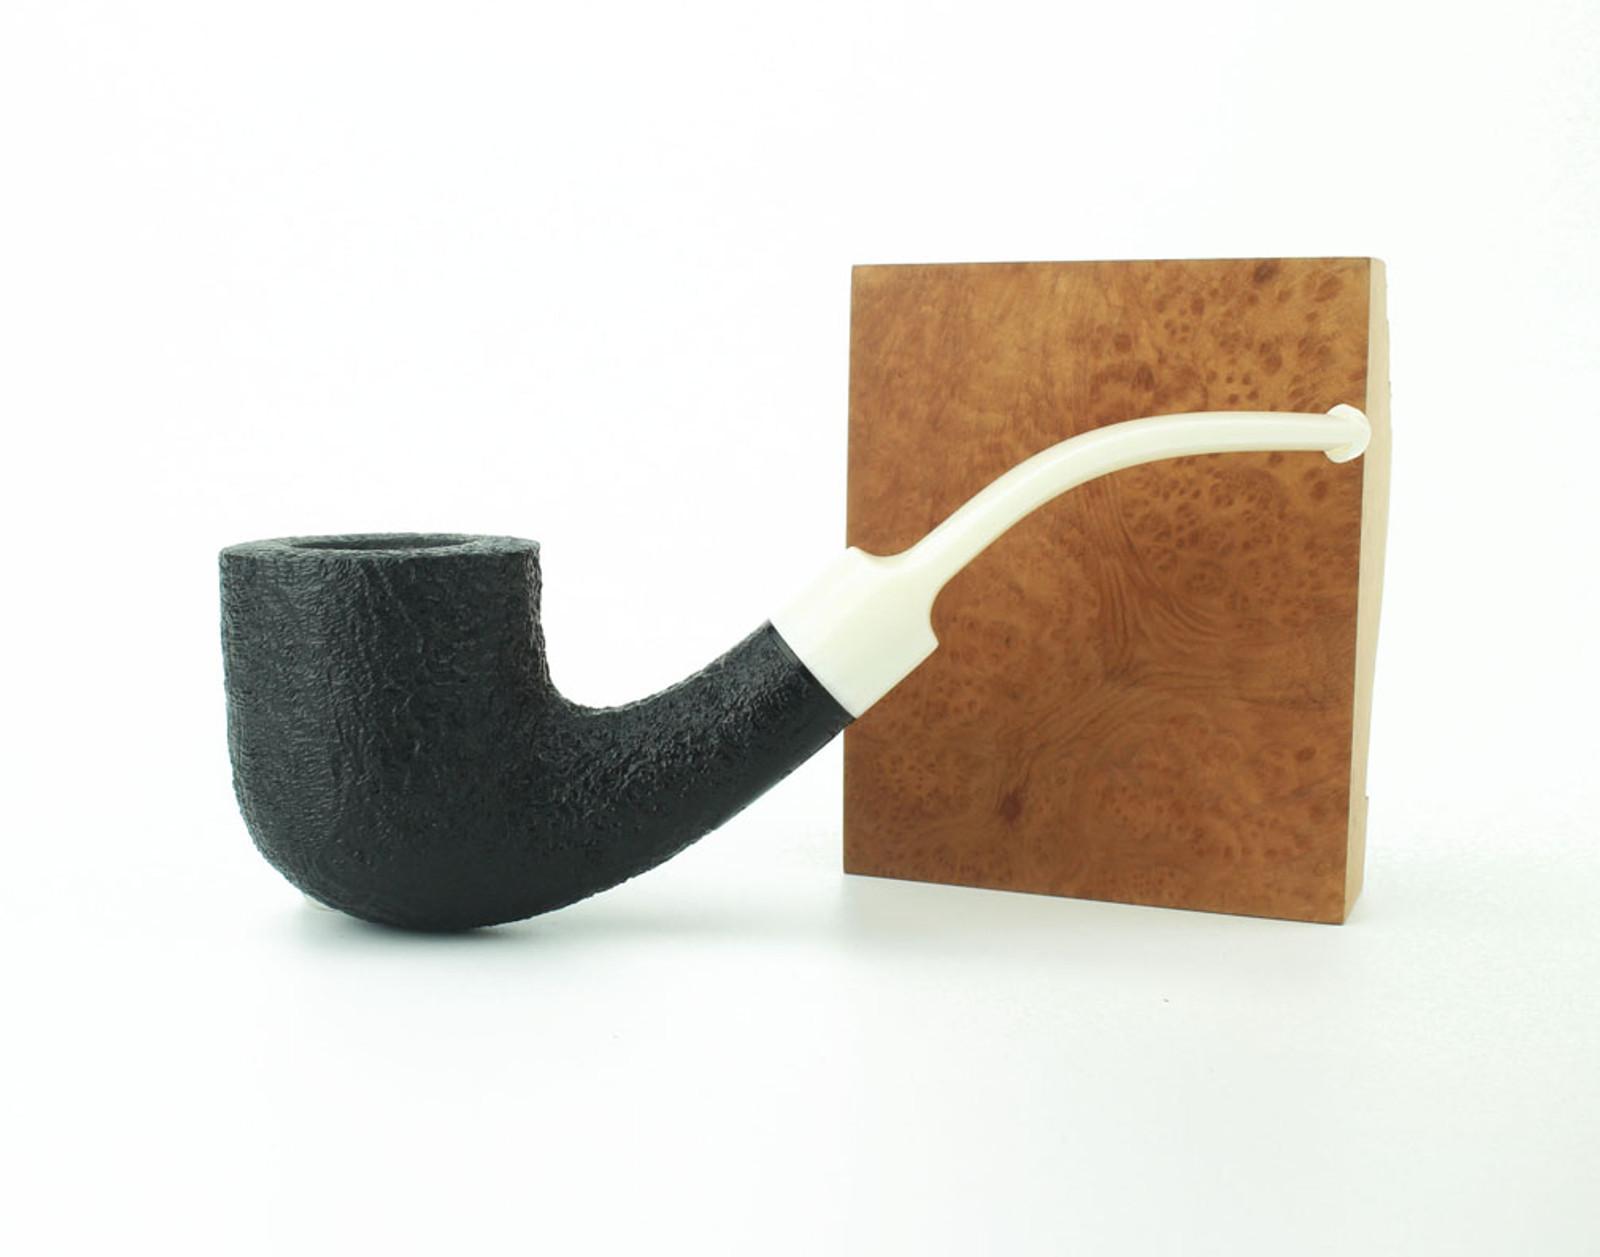 C131DB W - BriarWorks Classic C131 Bent Pot - Dark Blast w/ White Stem